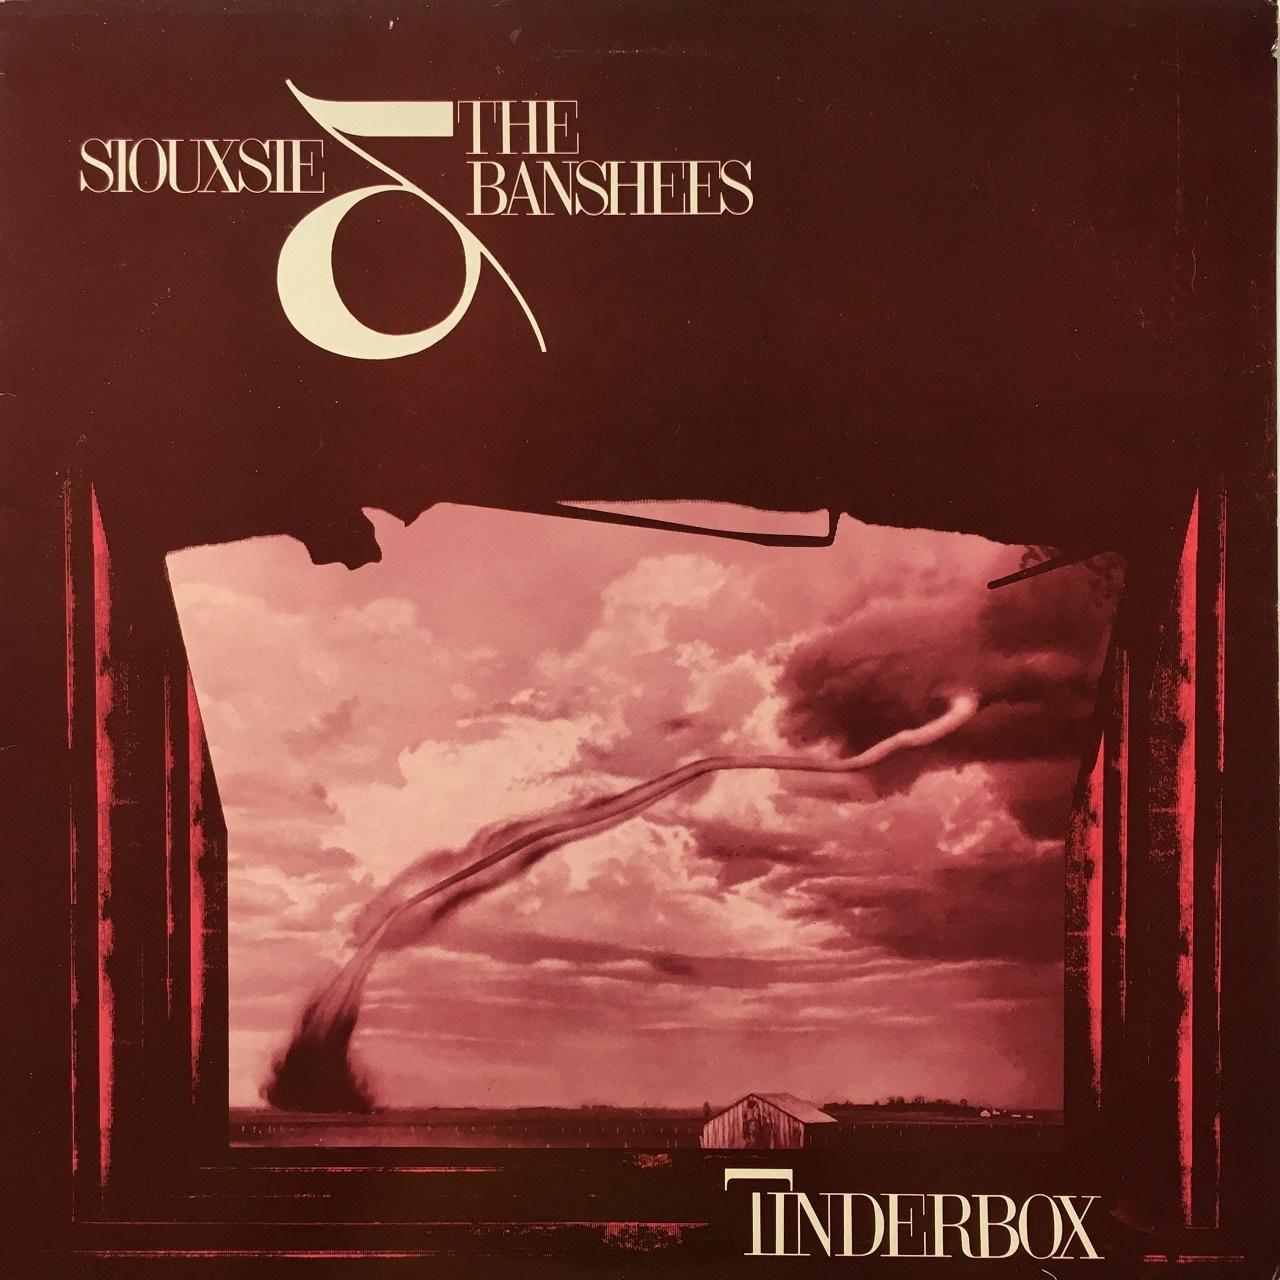 【LP・英盤】Siouxsie & The Banshees / Tinderbox